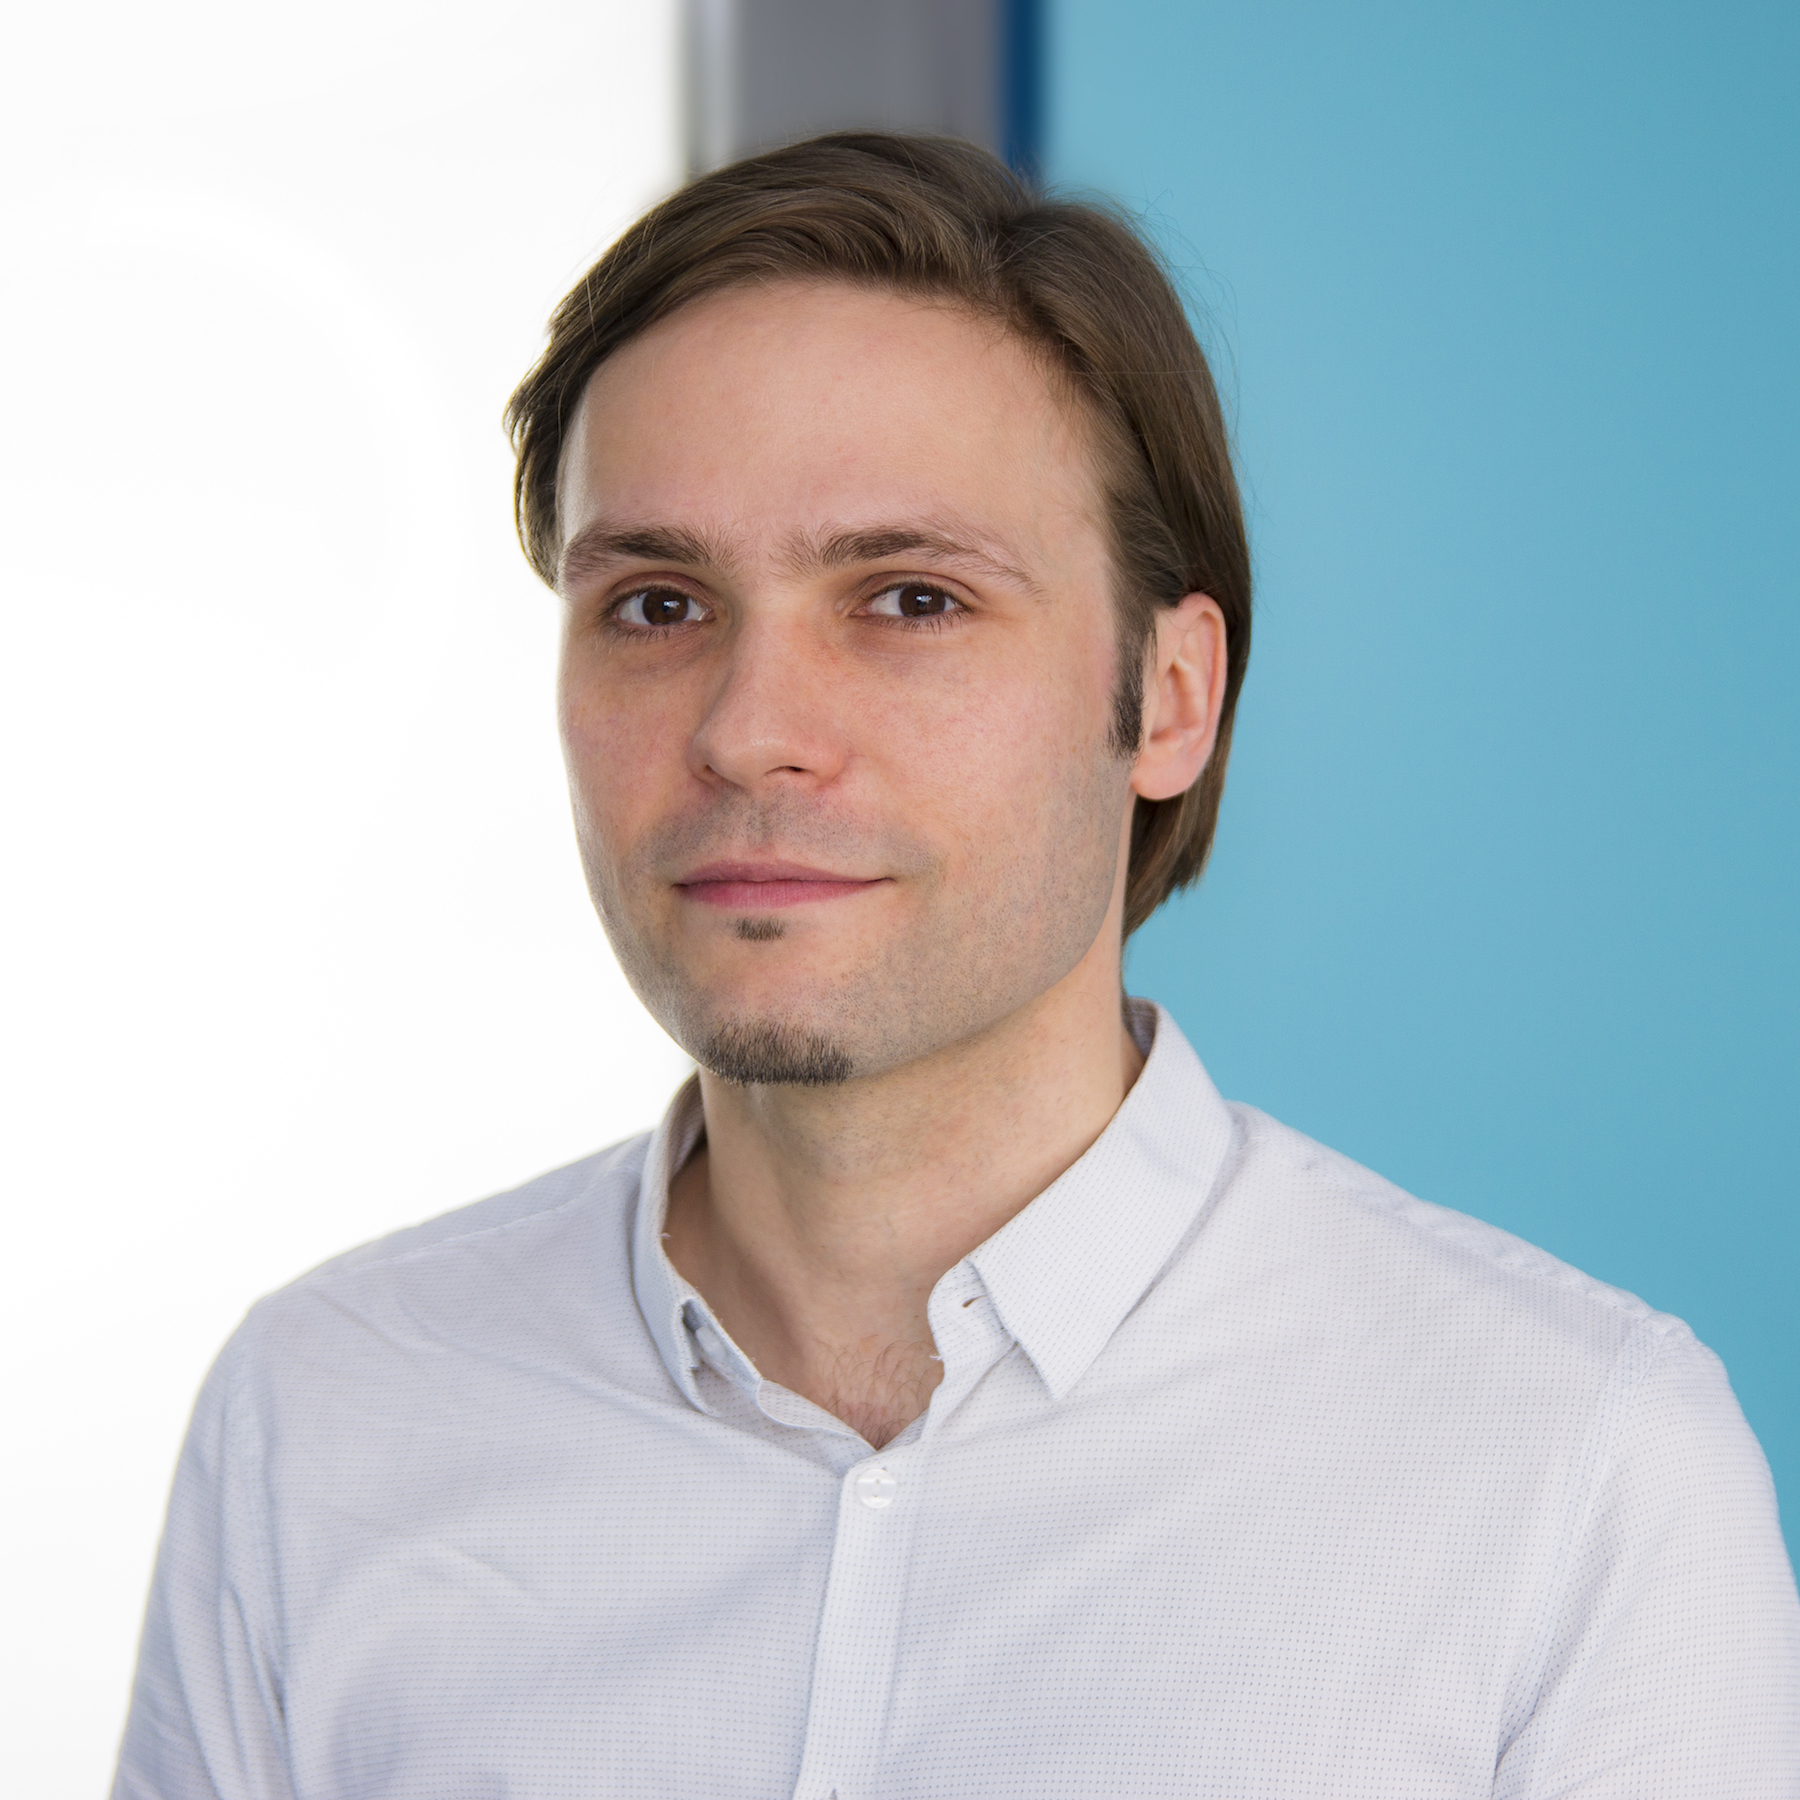 Mateusz Ruzik